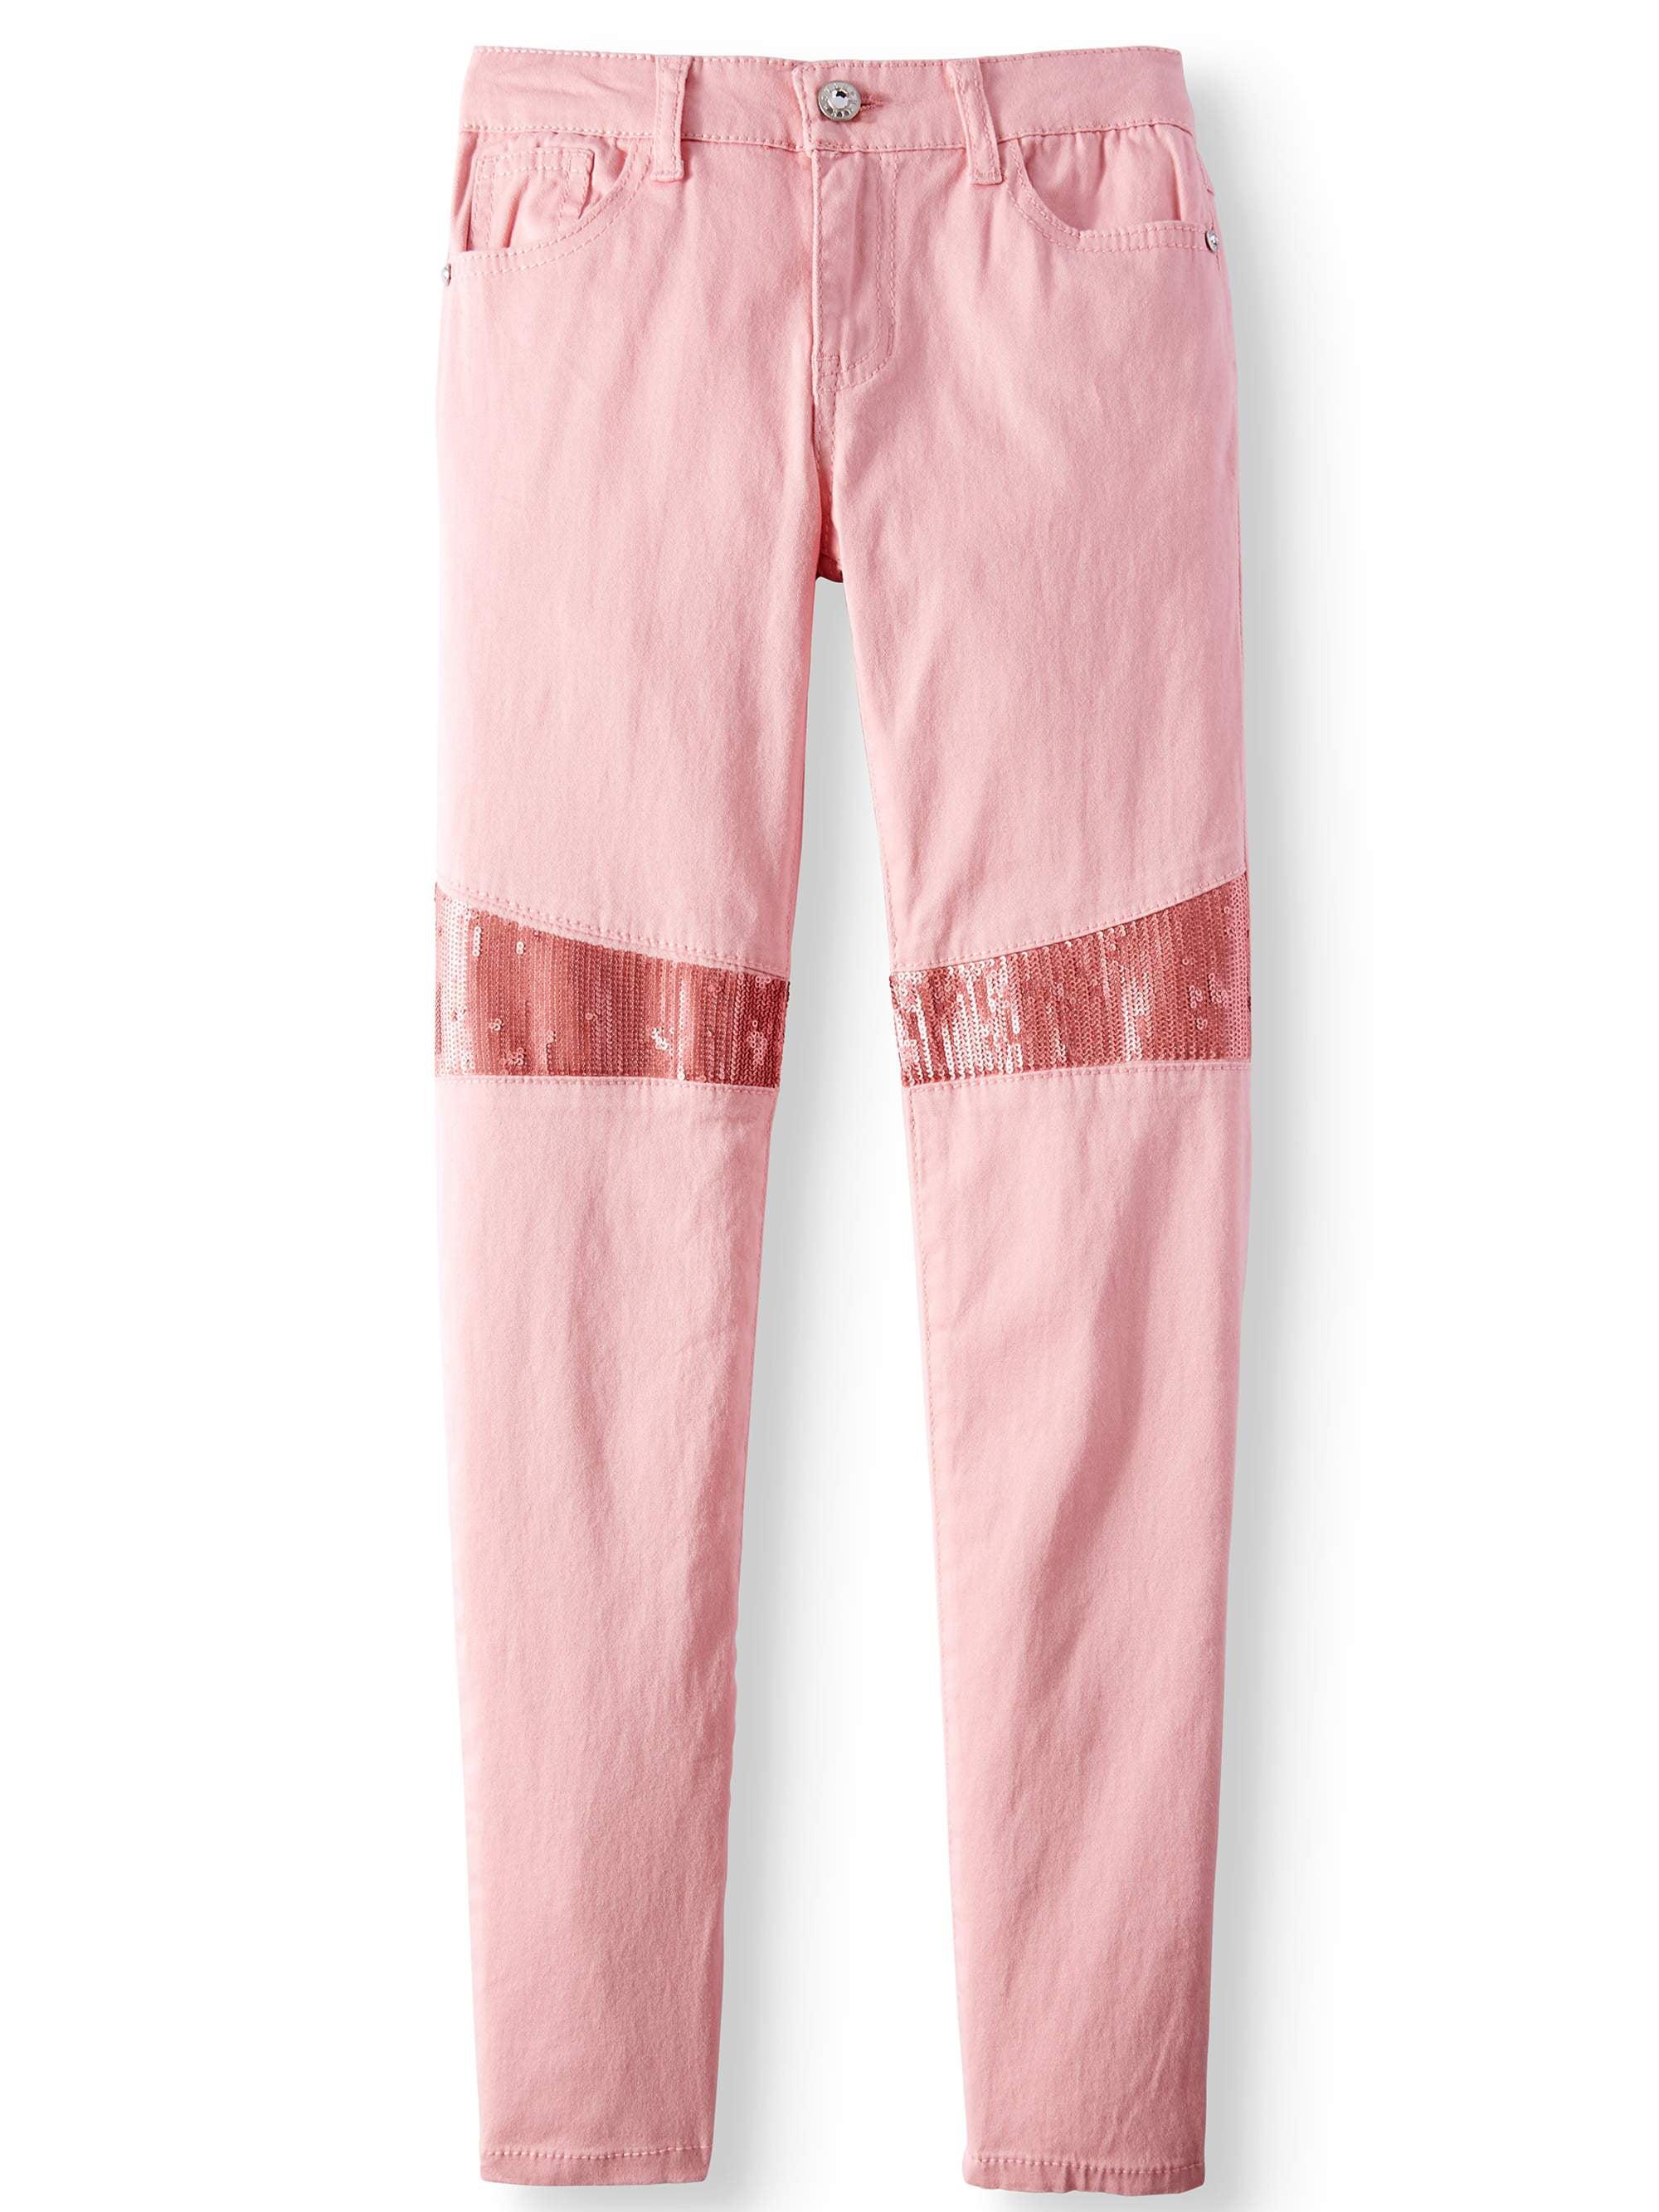 Sequin Inset Skinny Twill Pant (Big Girls)